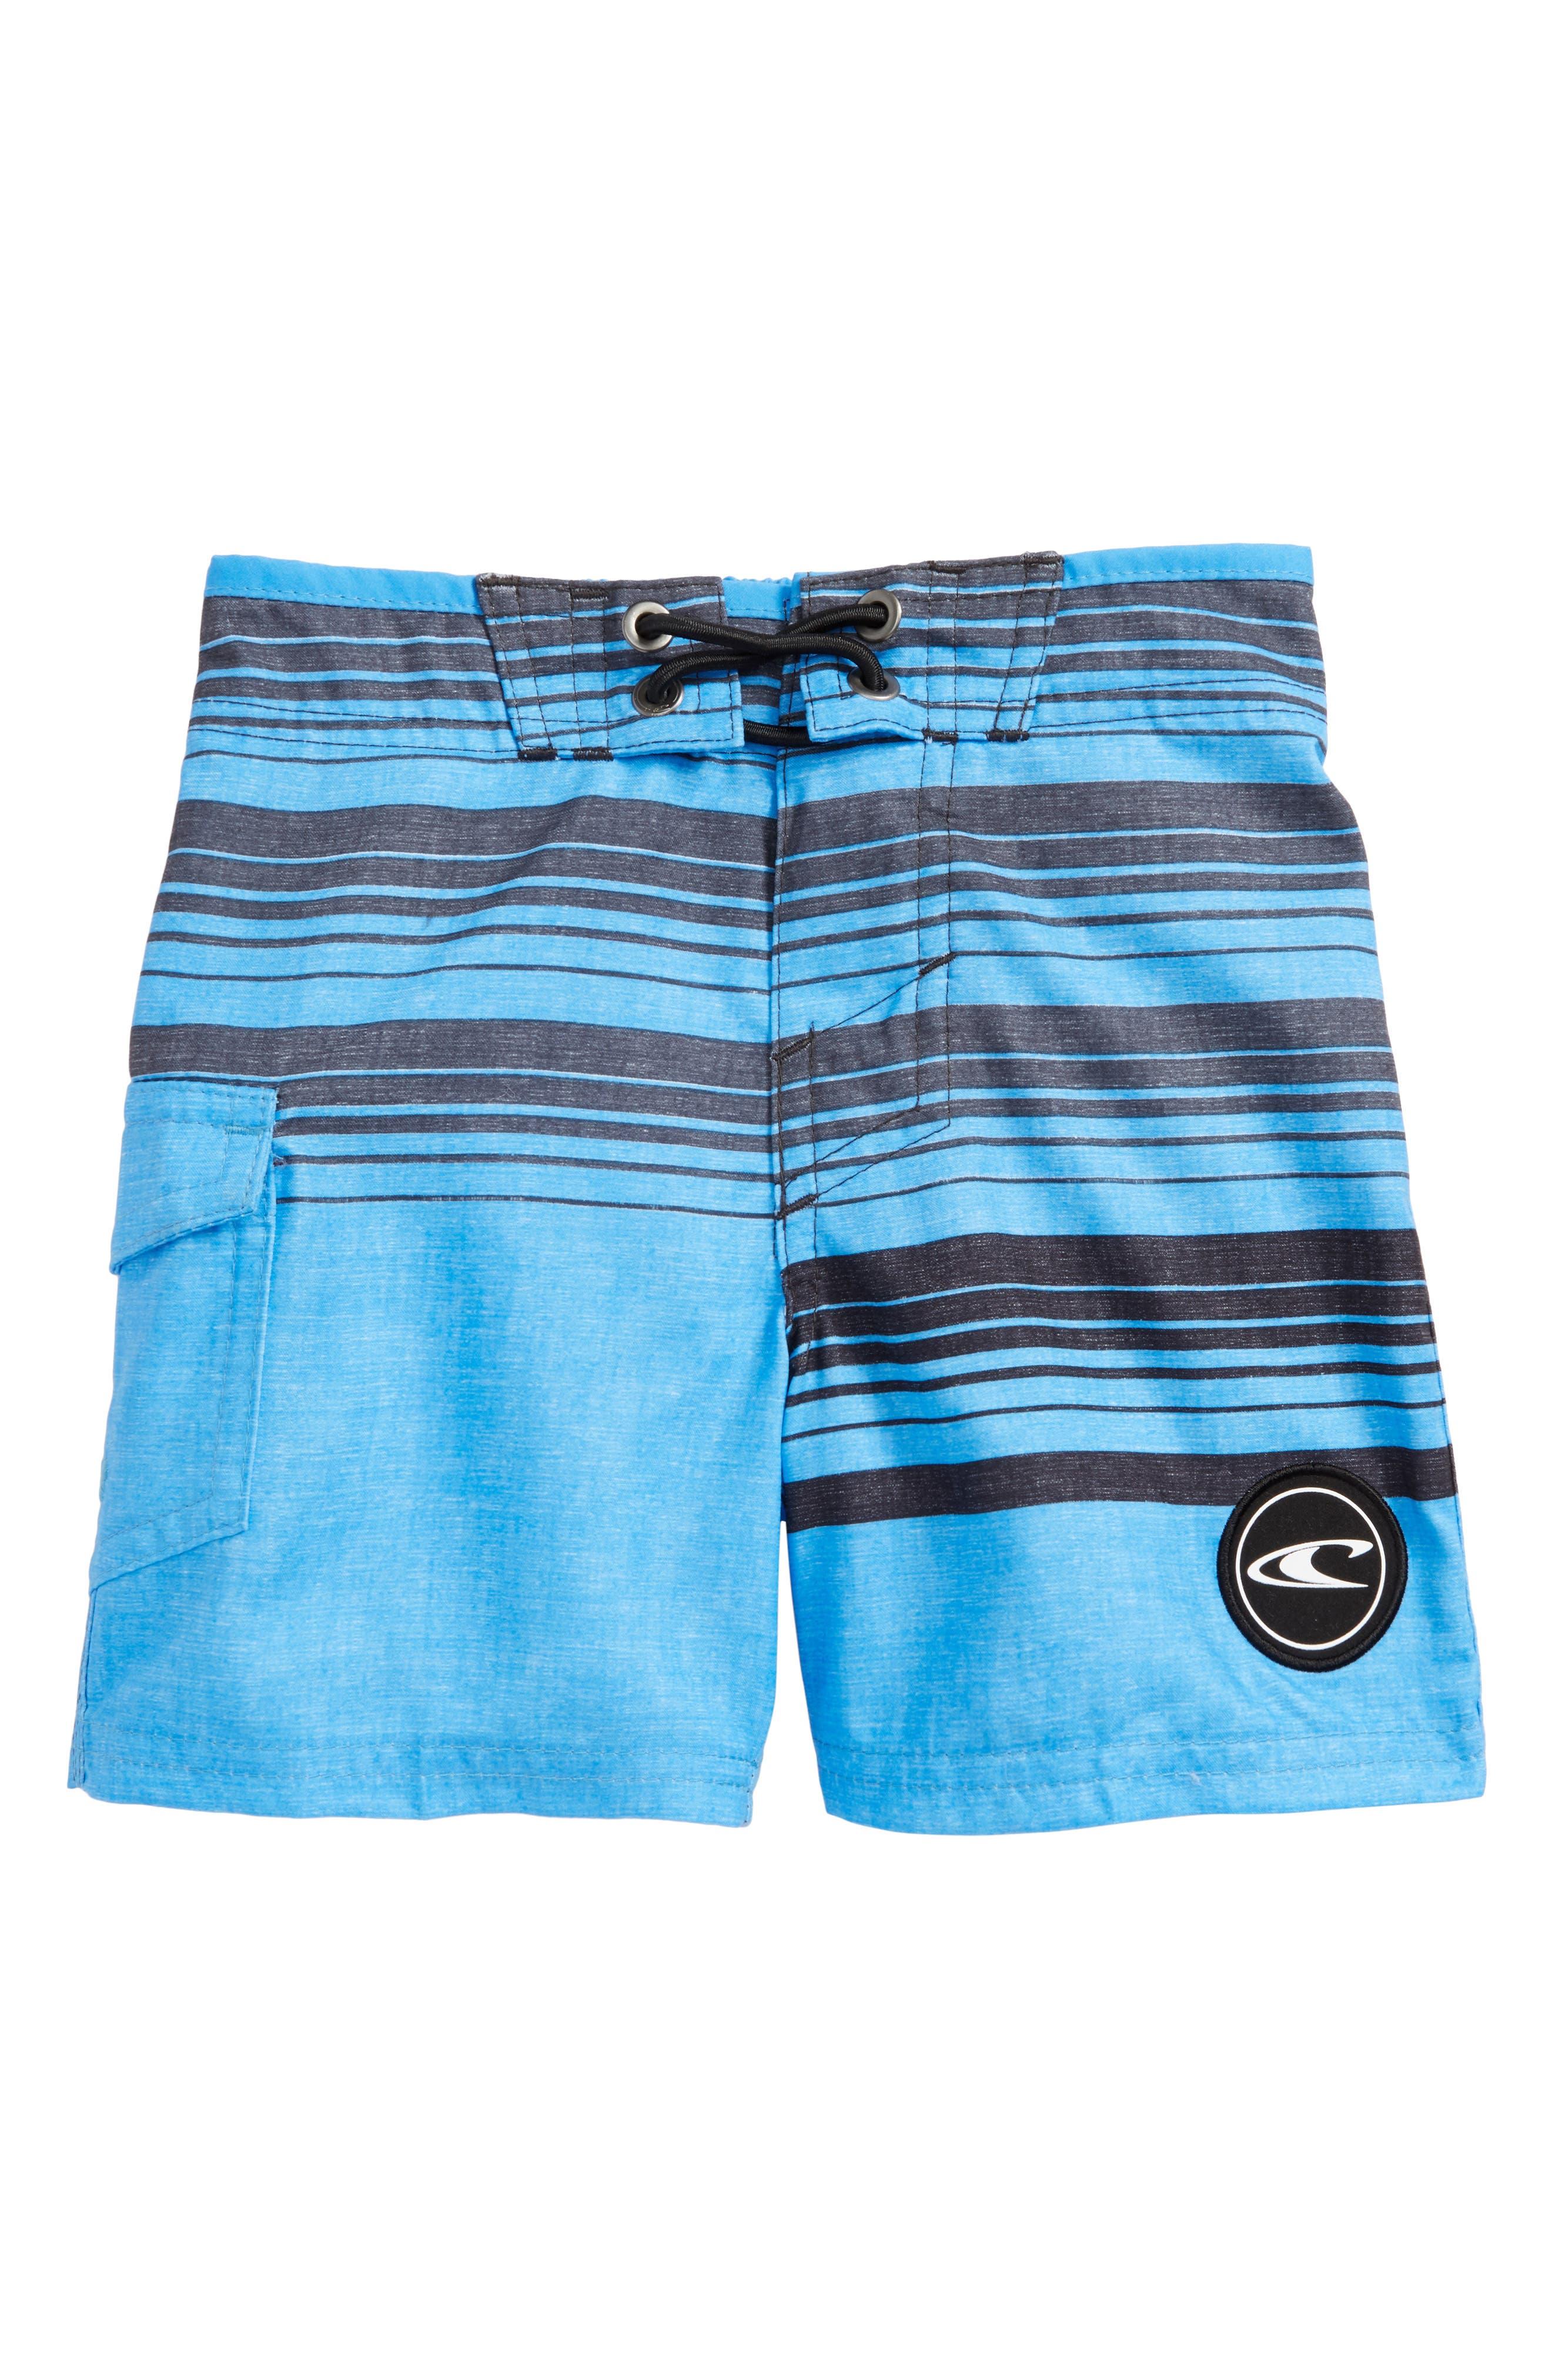 Bennett Board Shorts,                             Main thumbnail 1, color,                             400